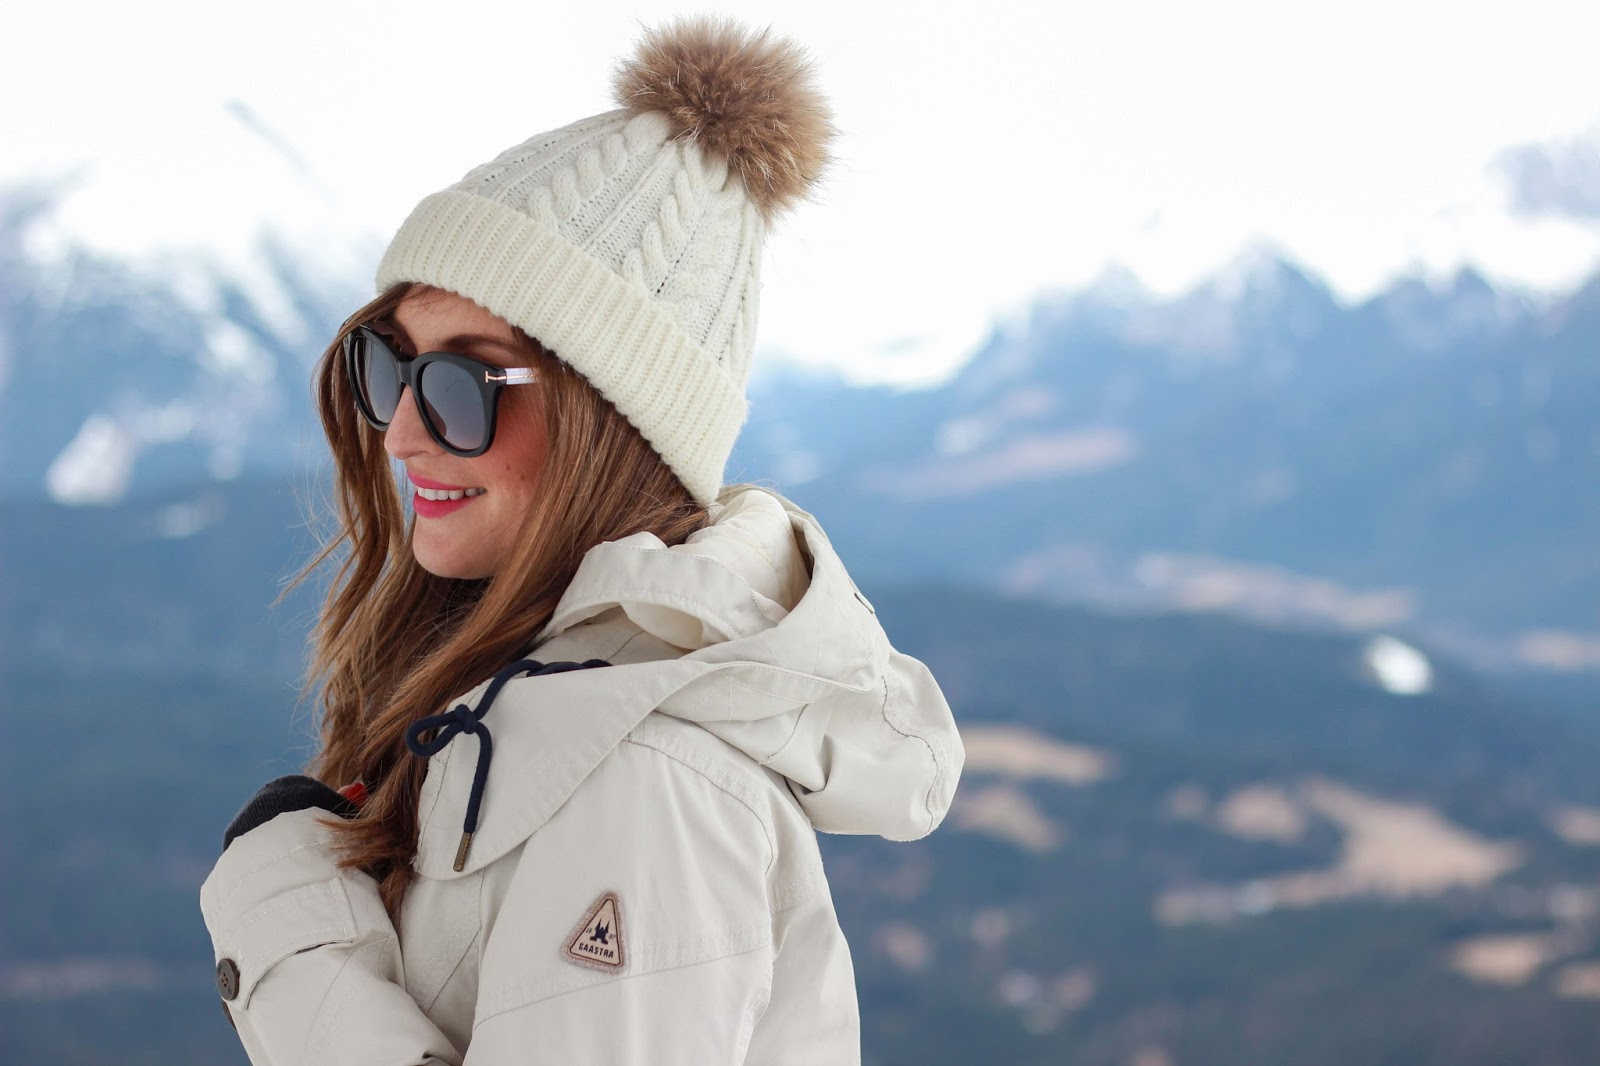 Outdoor Kleidung - Fashionblogger aus Deutschland - Travelblogger - Lifestyleblogger - Fashionblogger - Deutsche Fashionblogger - Fashionblog